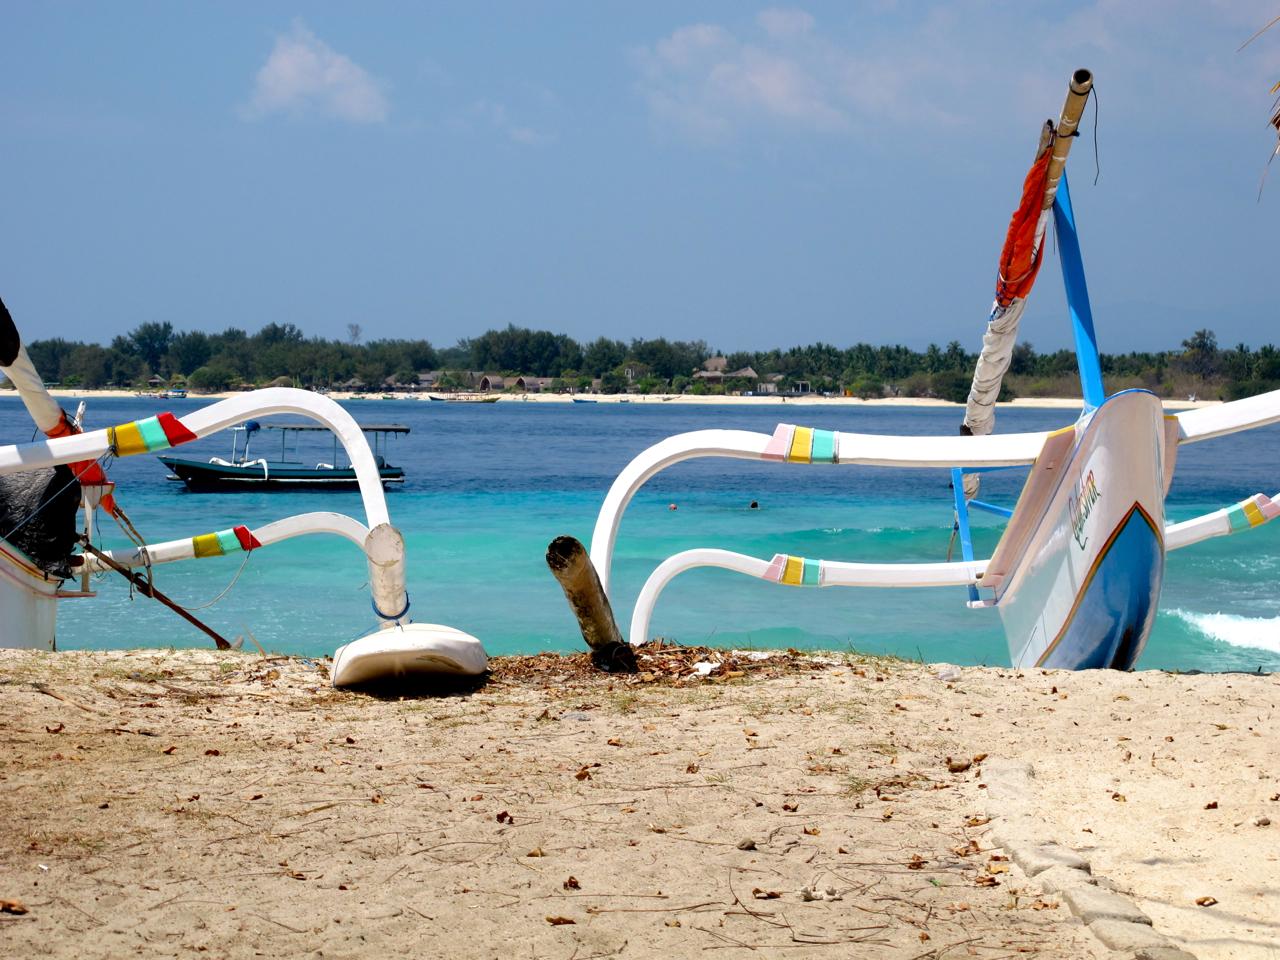 Bunte Boote liefern hervorragende Fotomotive auf den Gili Islands.